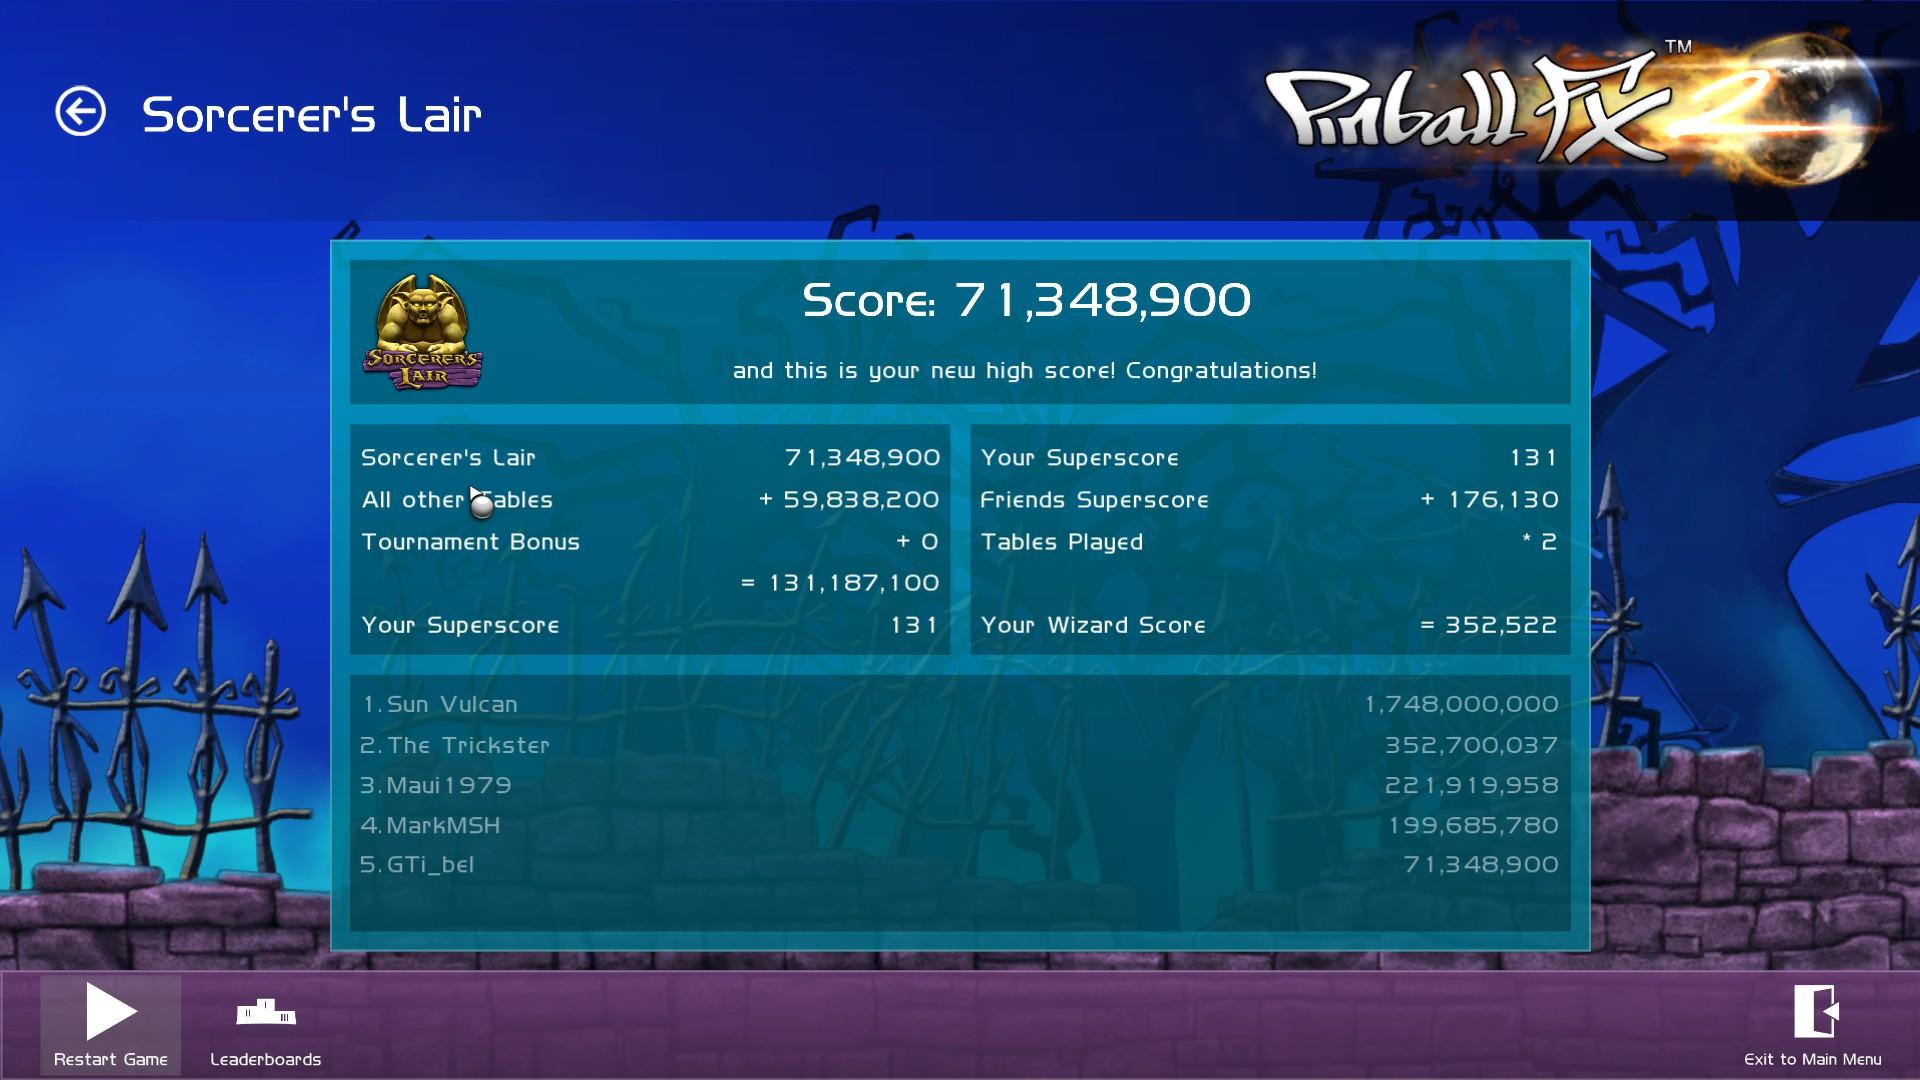 GTibel: Pinball FX 2: Sorcerer